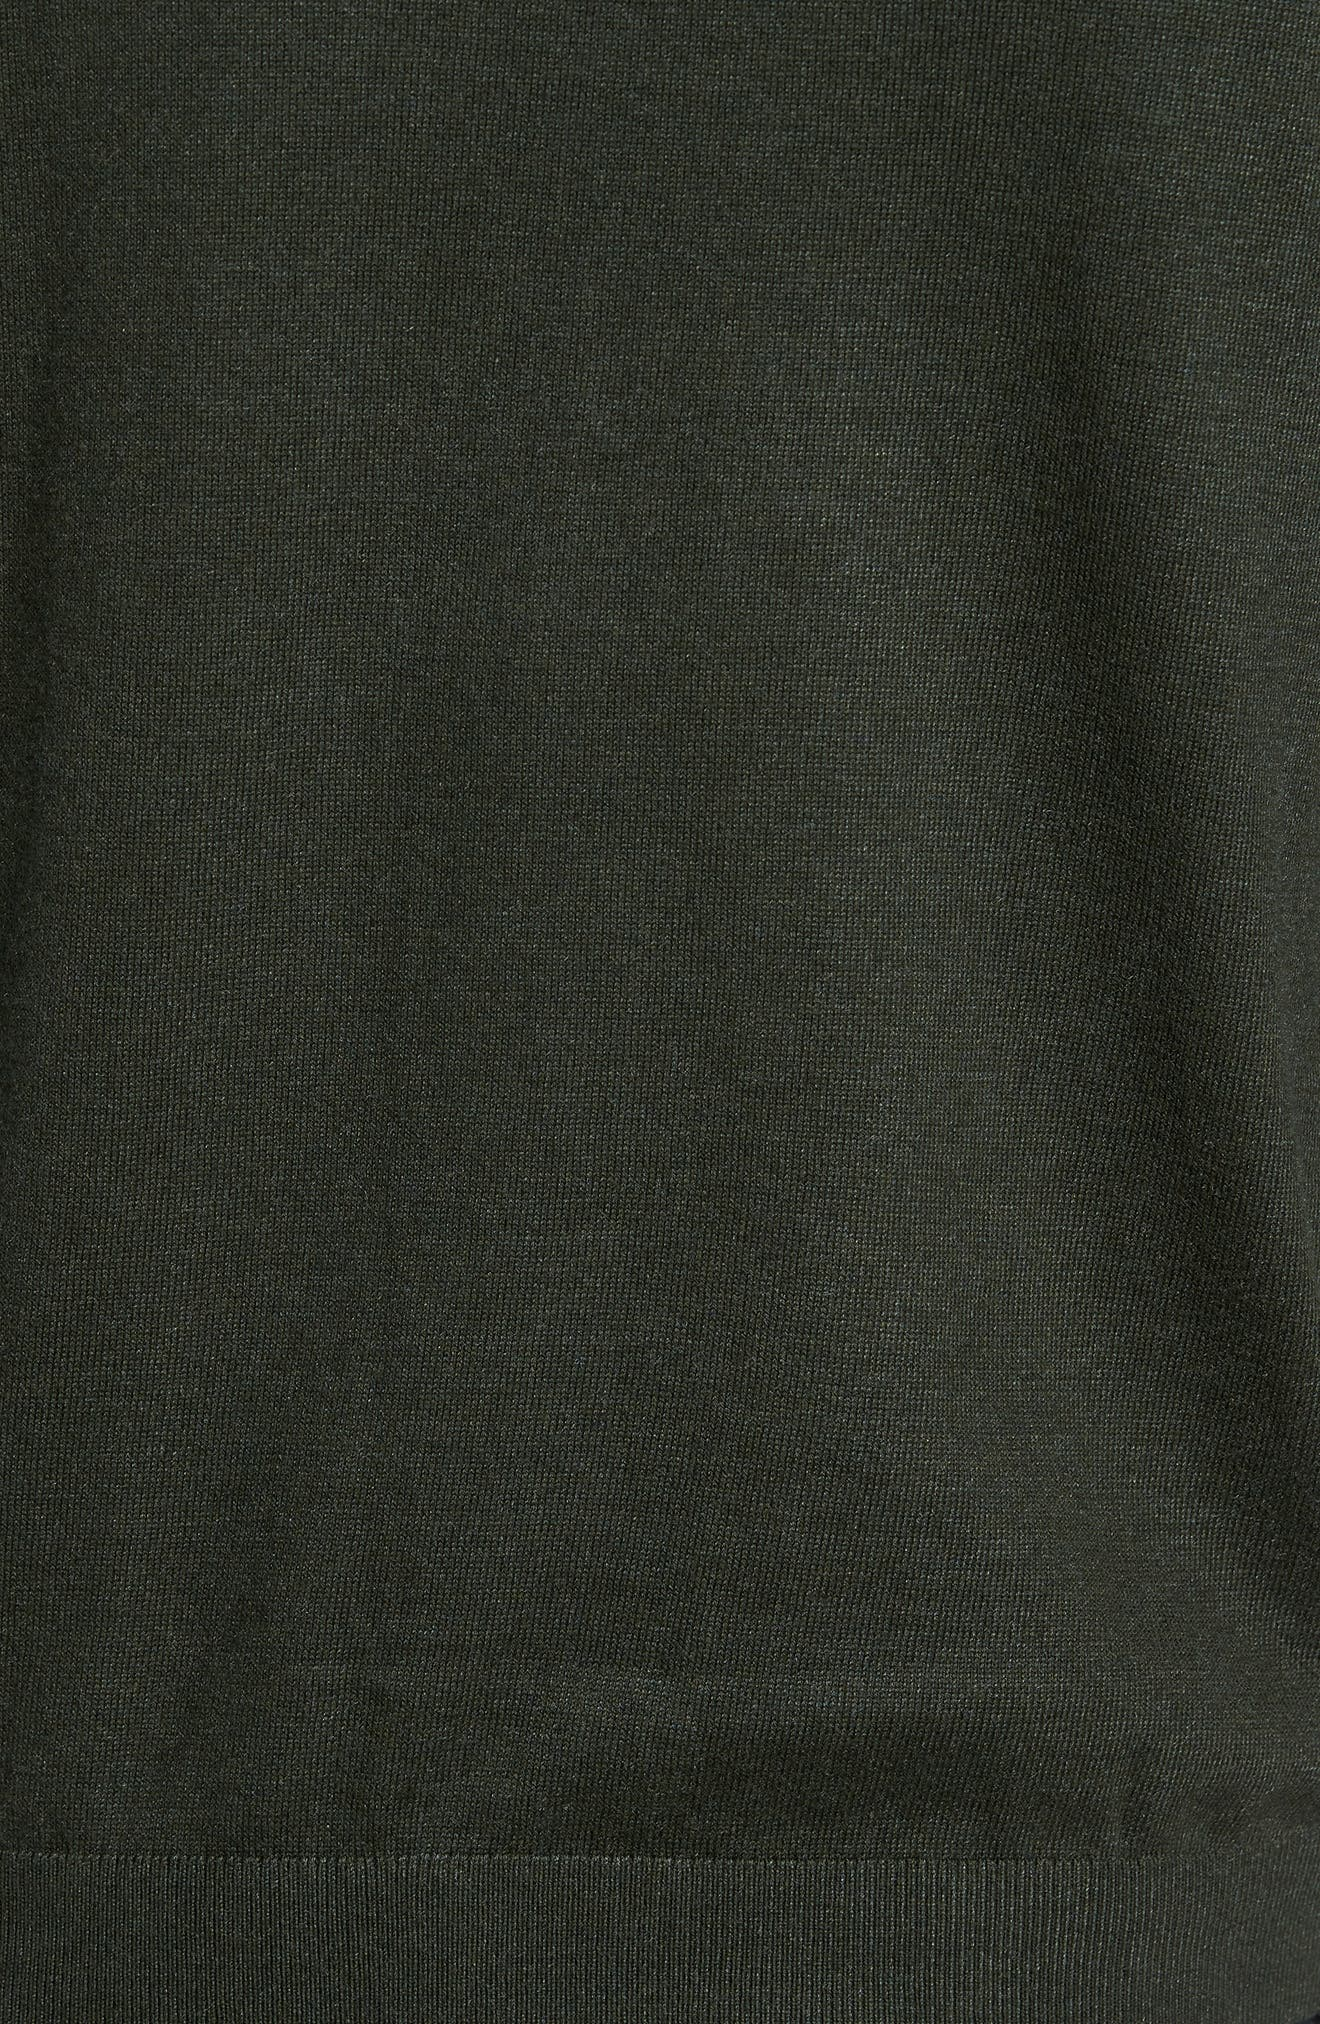 Pepmint Herringbone Sleeve Sweatshirt,                             Alternate thumbnail 5, color,                             Khaki